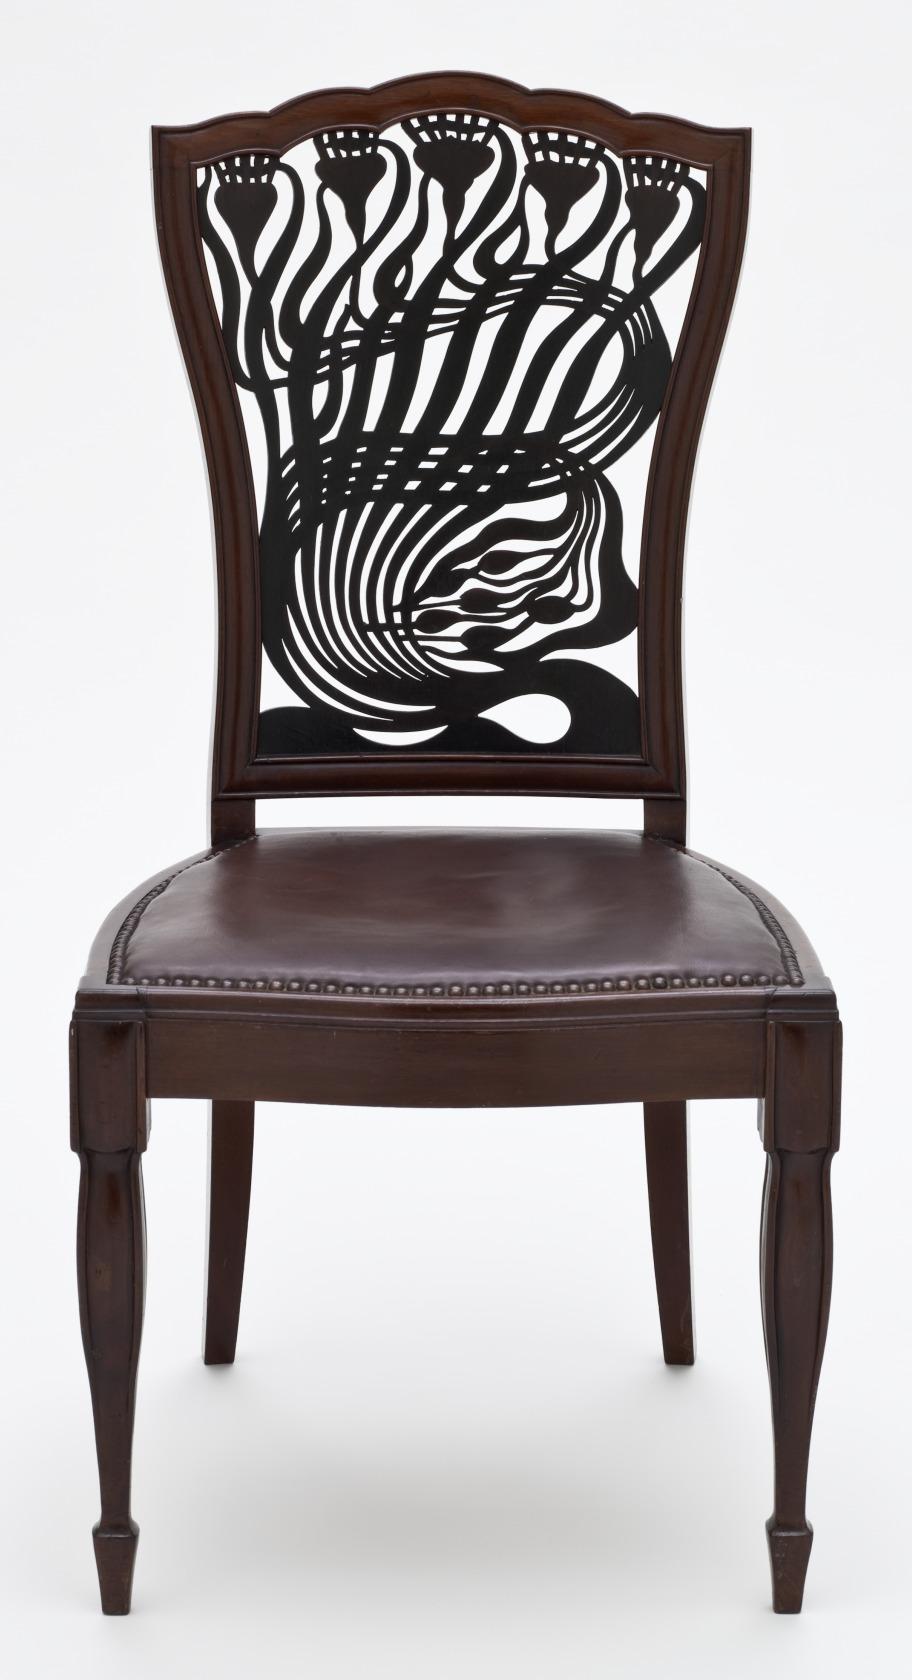 arthur heygate mackmurdo wikip dia. Black Bedroom Furniture Sets. Home Design Ideas